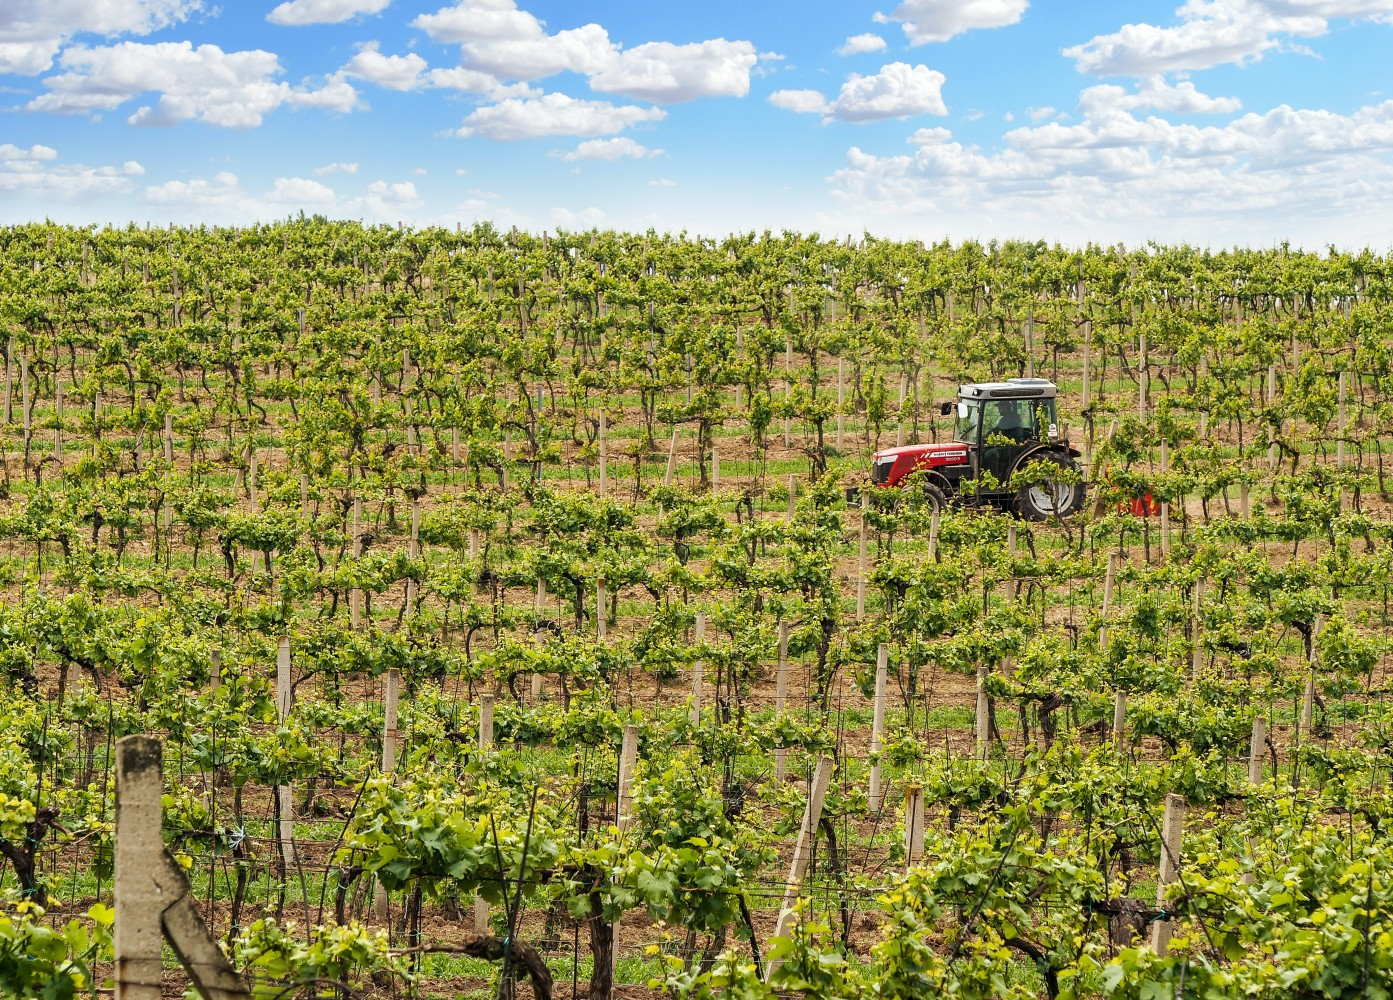 Italský vinohrad, kde rostou hrozny pro prosecco